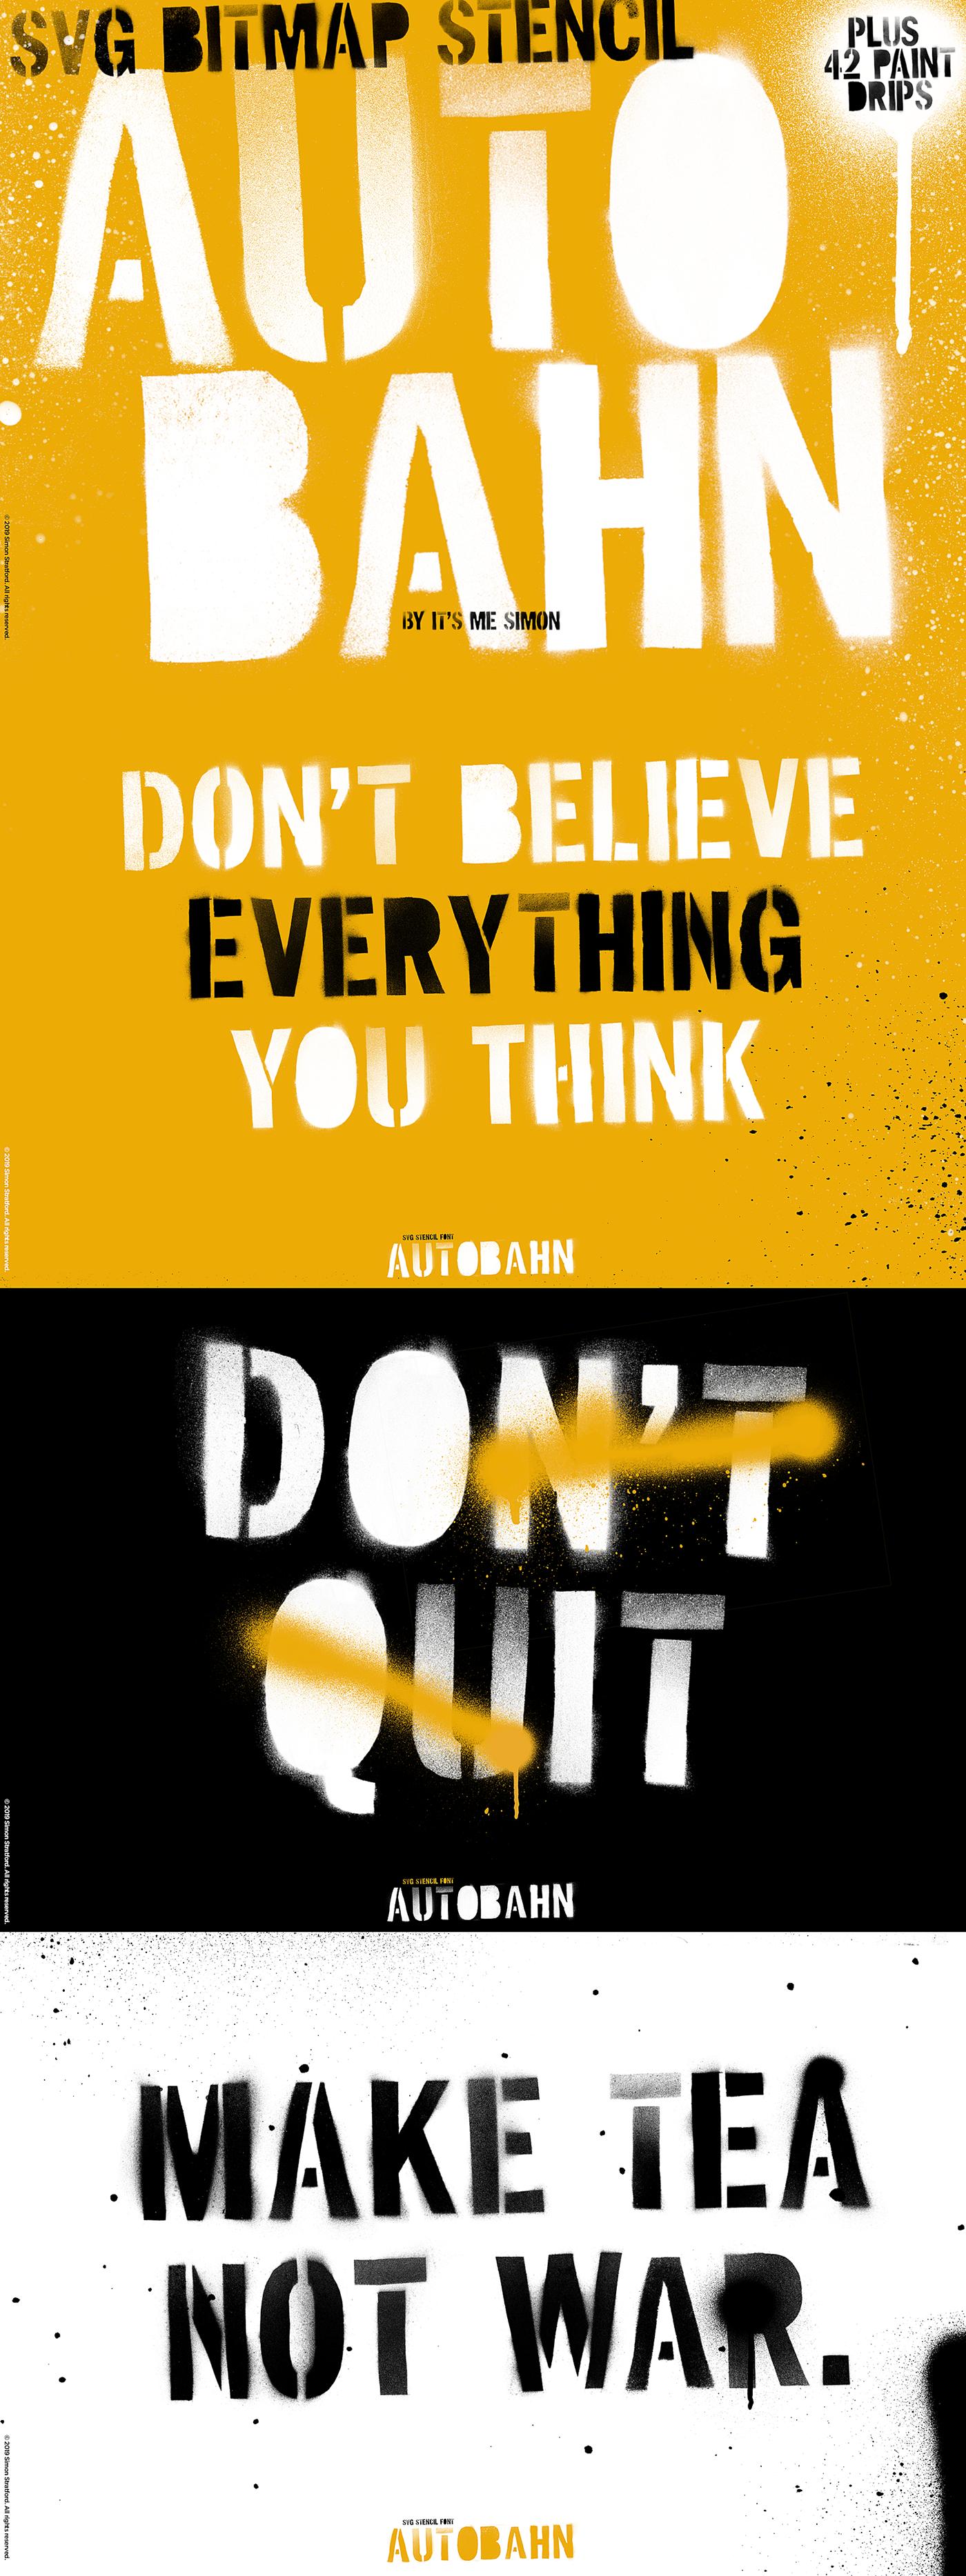 font Typeface OpenType-SVG bitmap stencil stencil font dispaly spray paint paint grunge